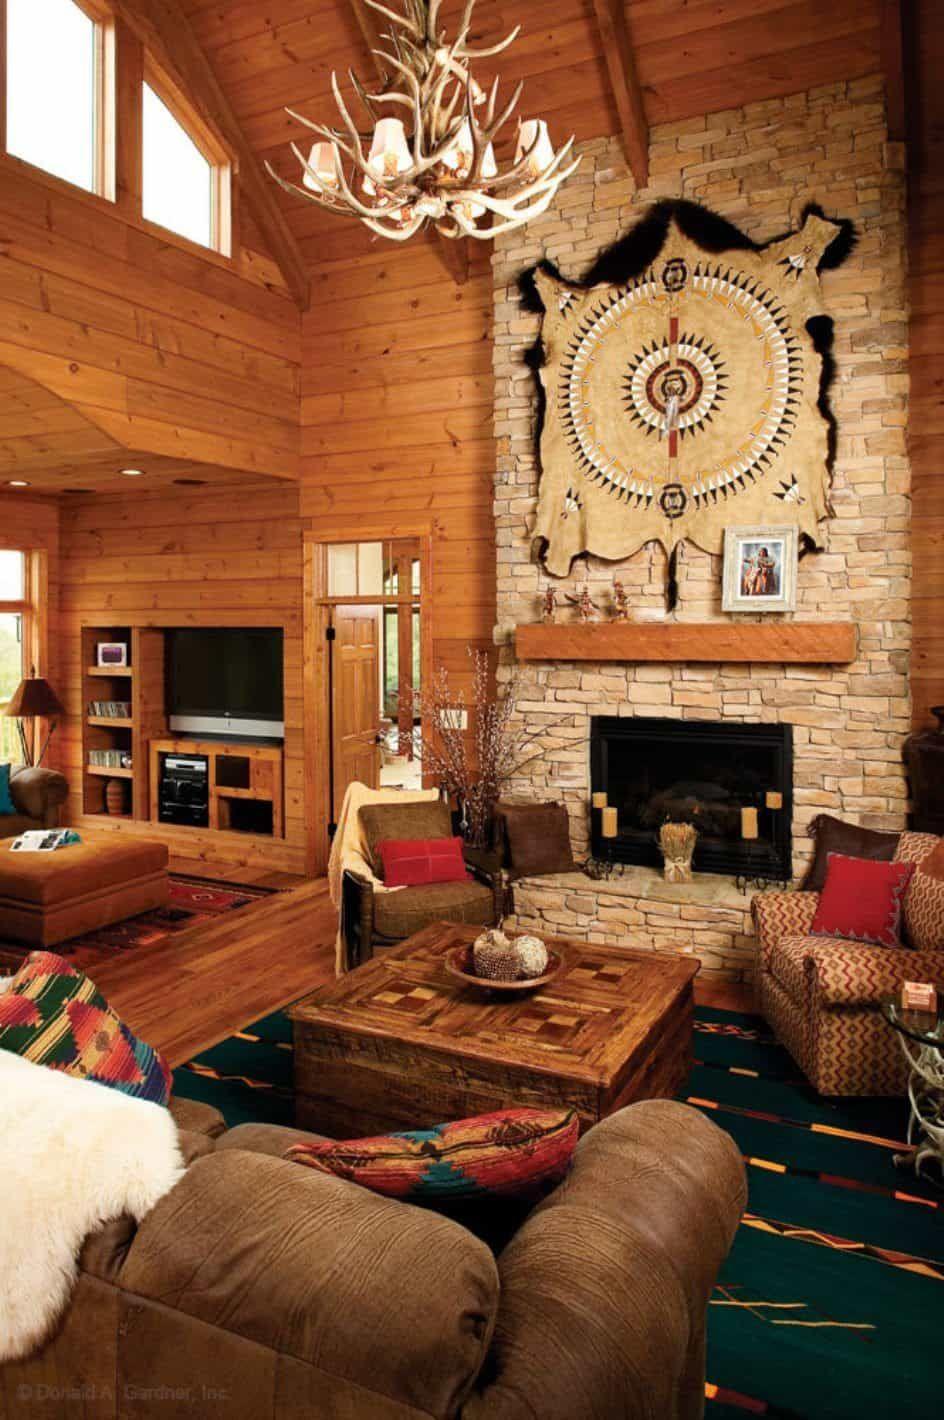 Best Vibrant And Warm Southwest Decor Southwestern Home Decor 640 x 480